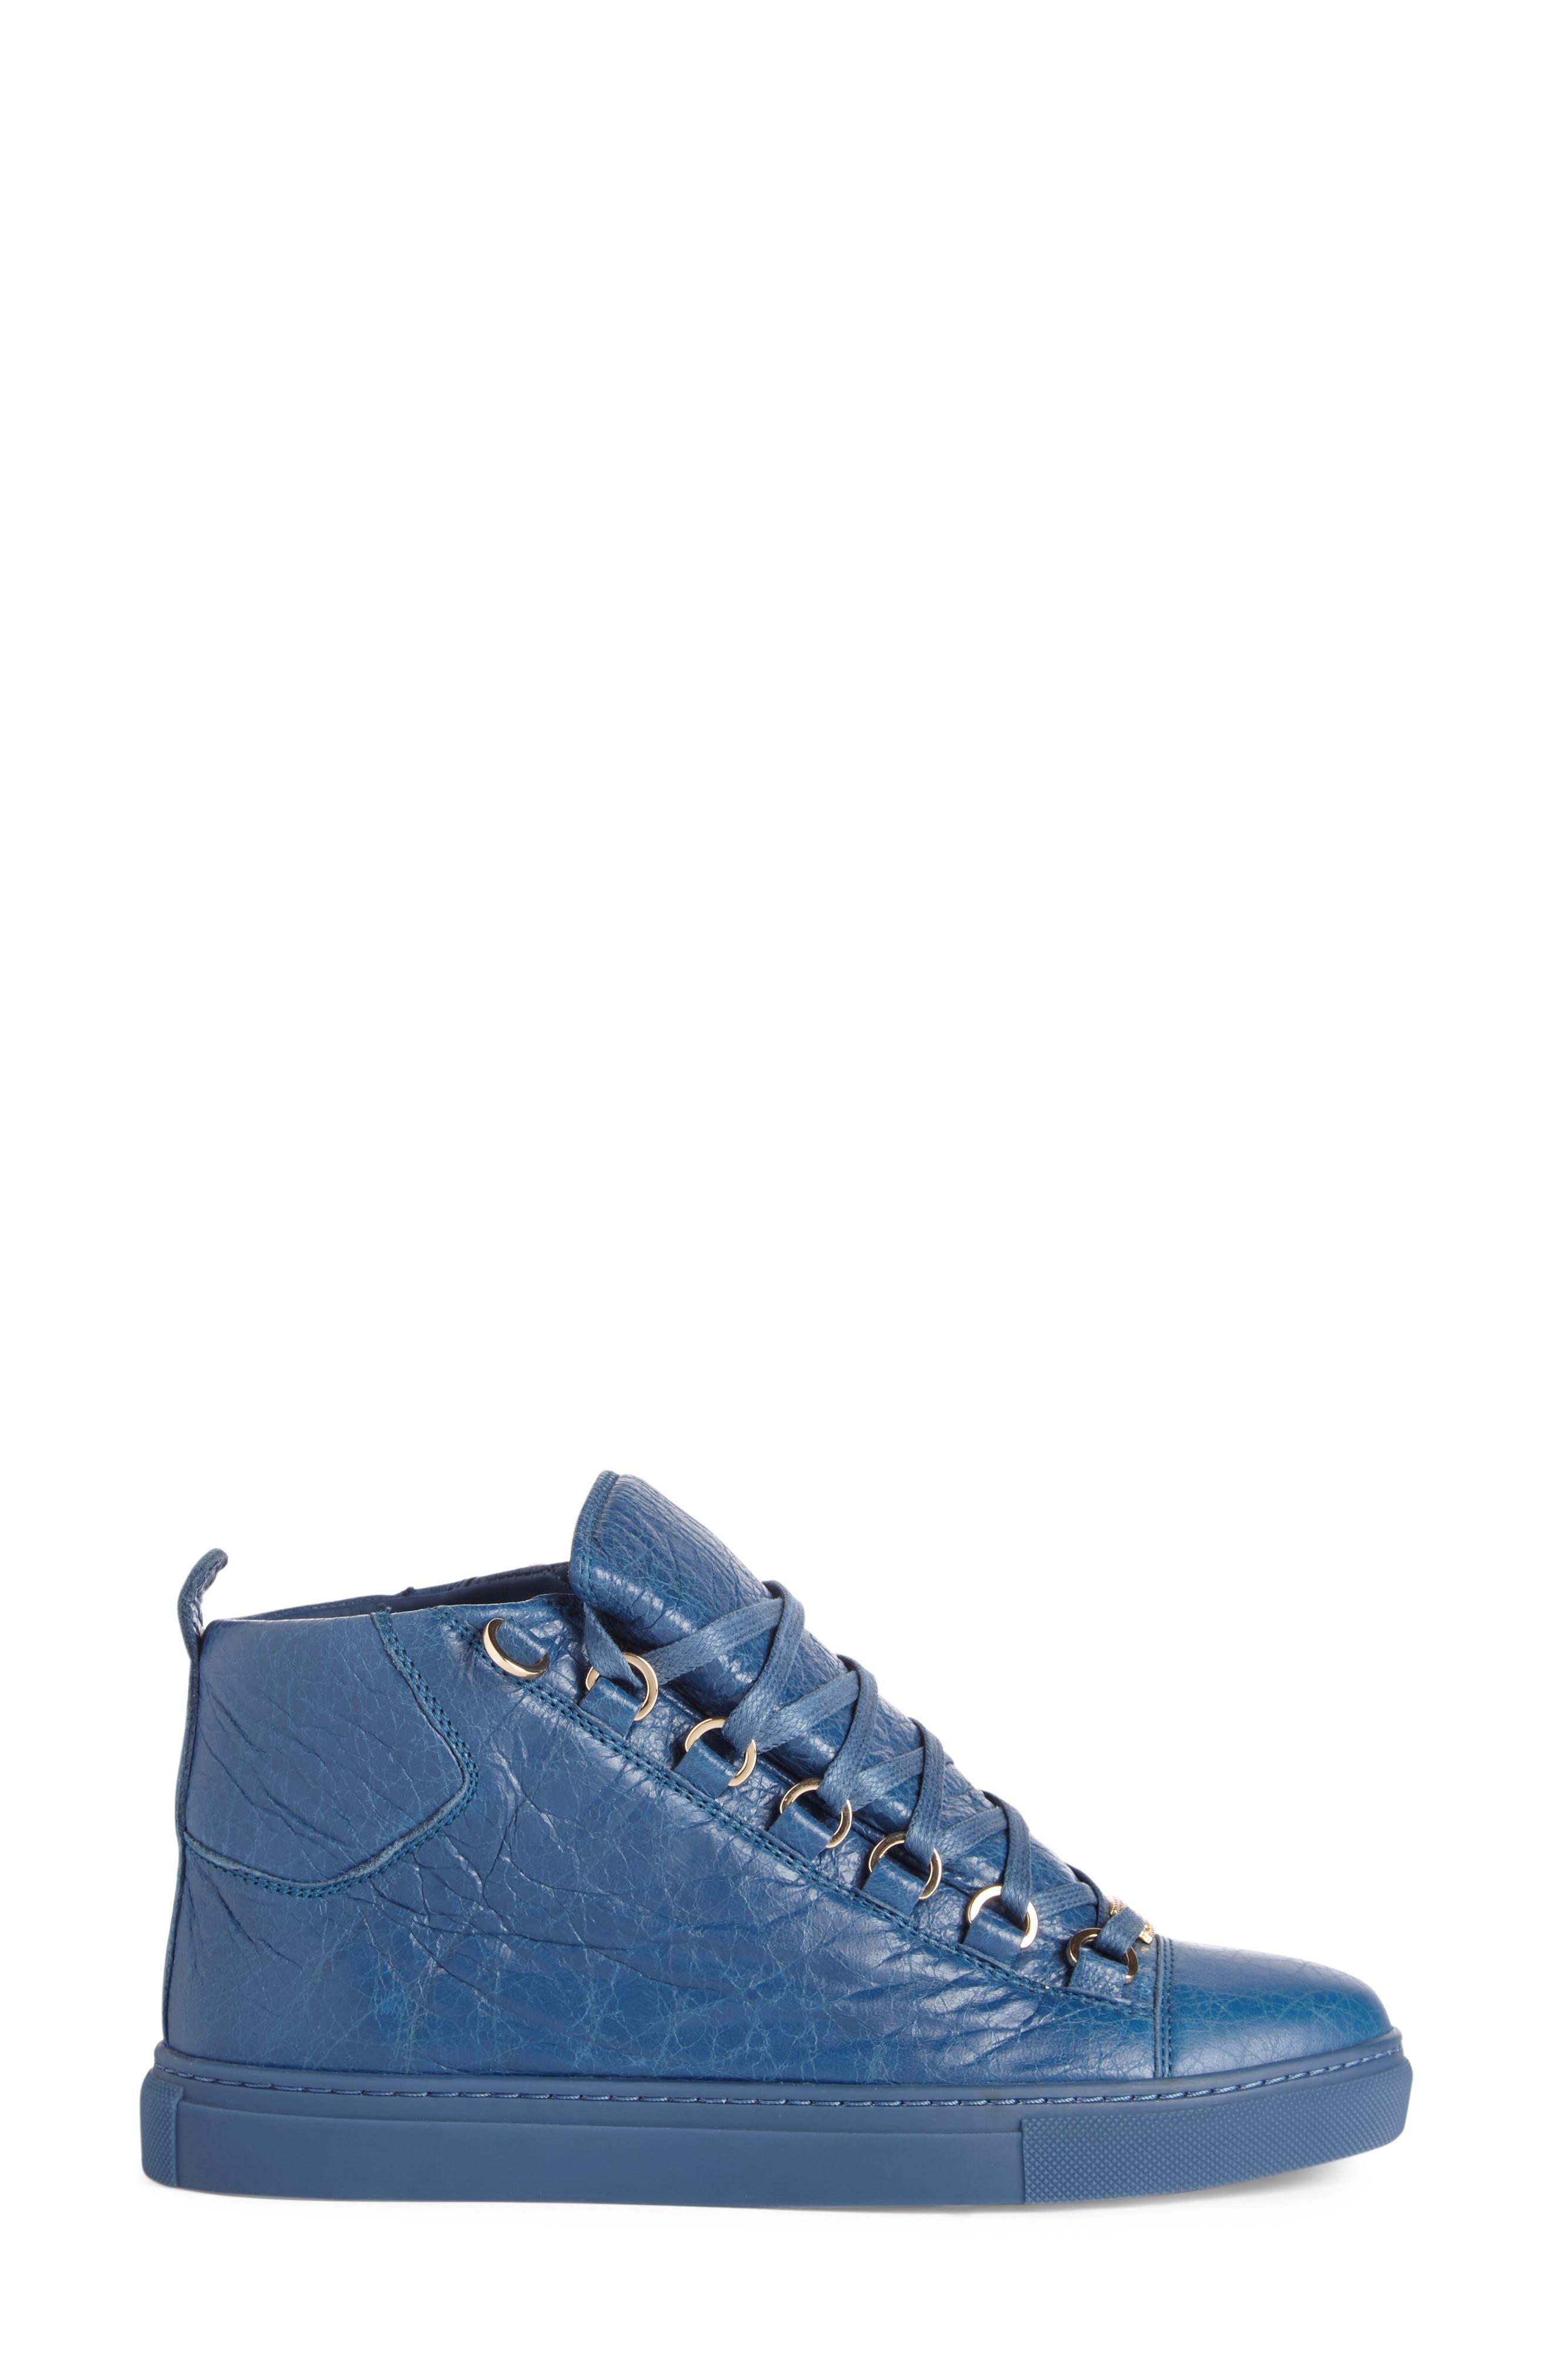 High Top Sneaker,                             Alternate thumbnail 20, color,